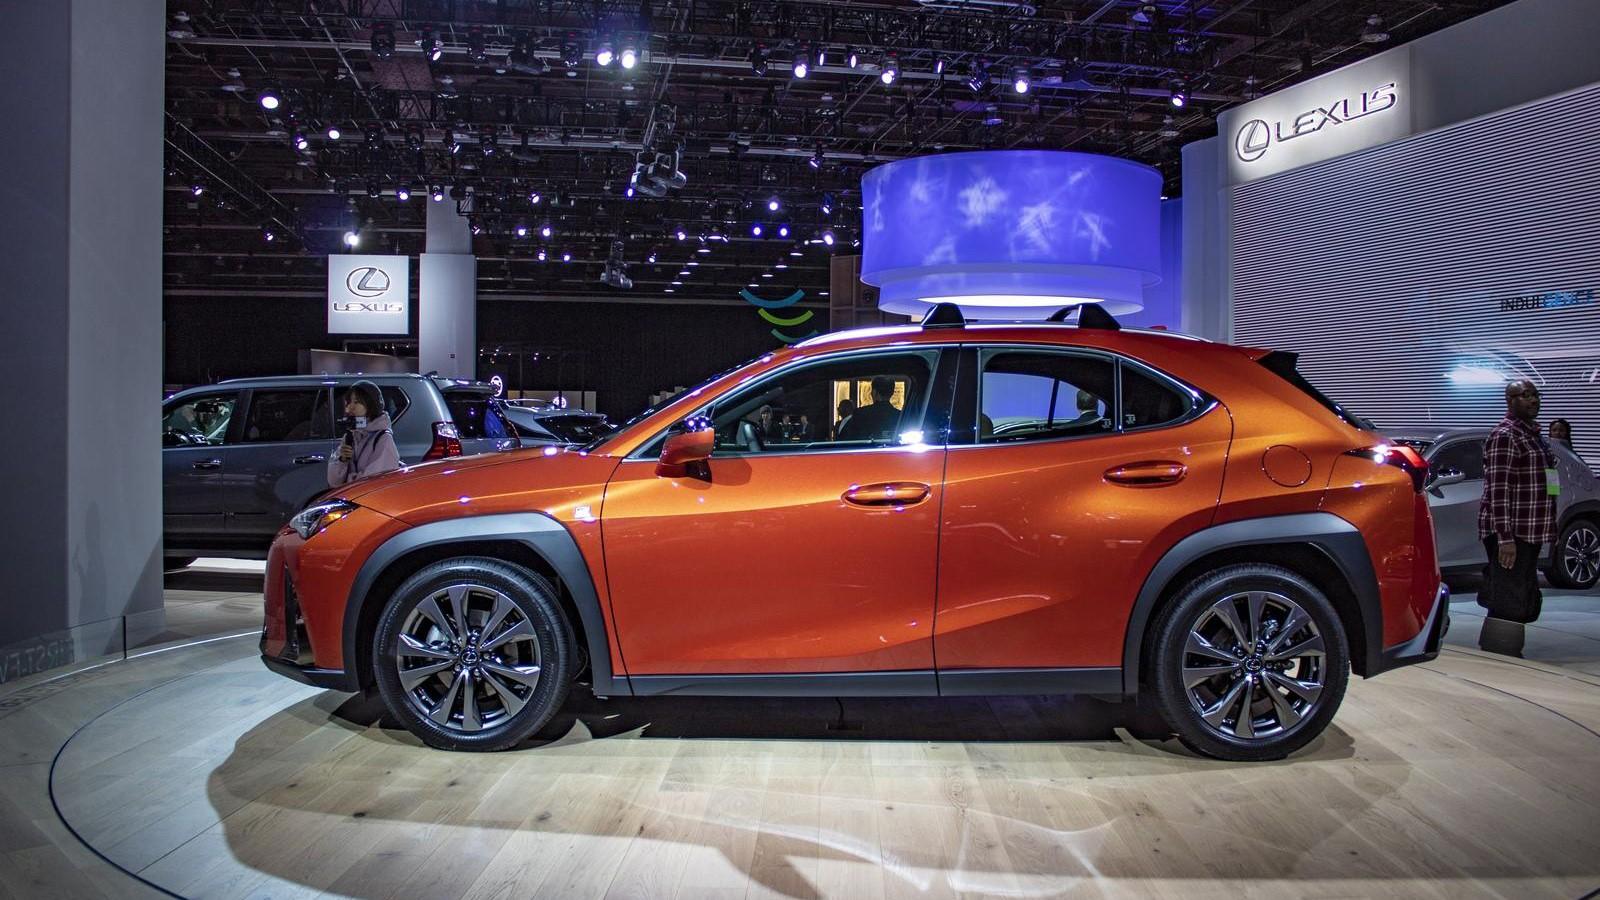 Novyj Lexus UX 2019 jekster'er, vneshnij vid, vid sboku, obzor, foto, tehnicheskie harakteristiki